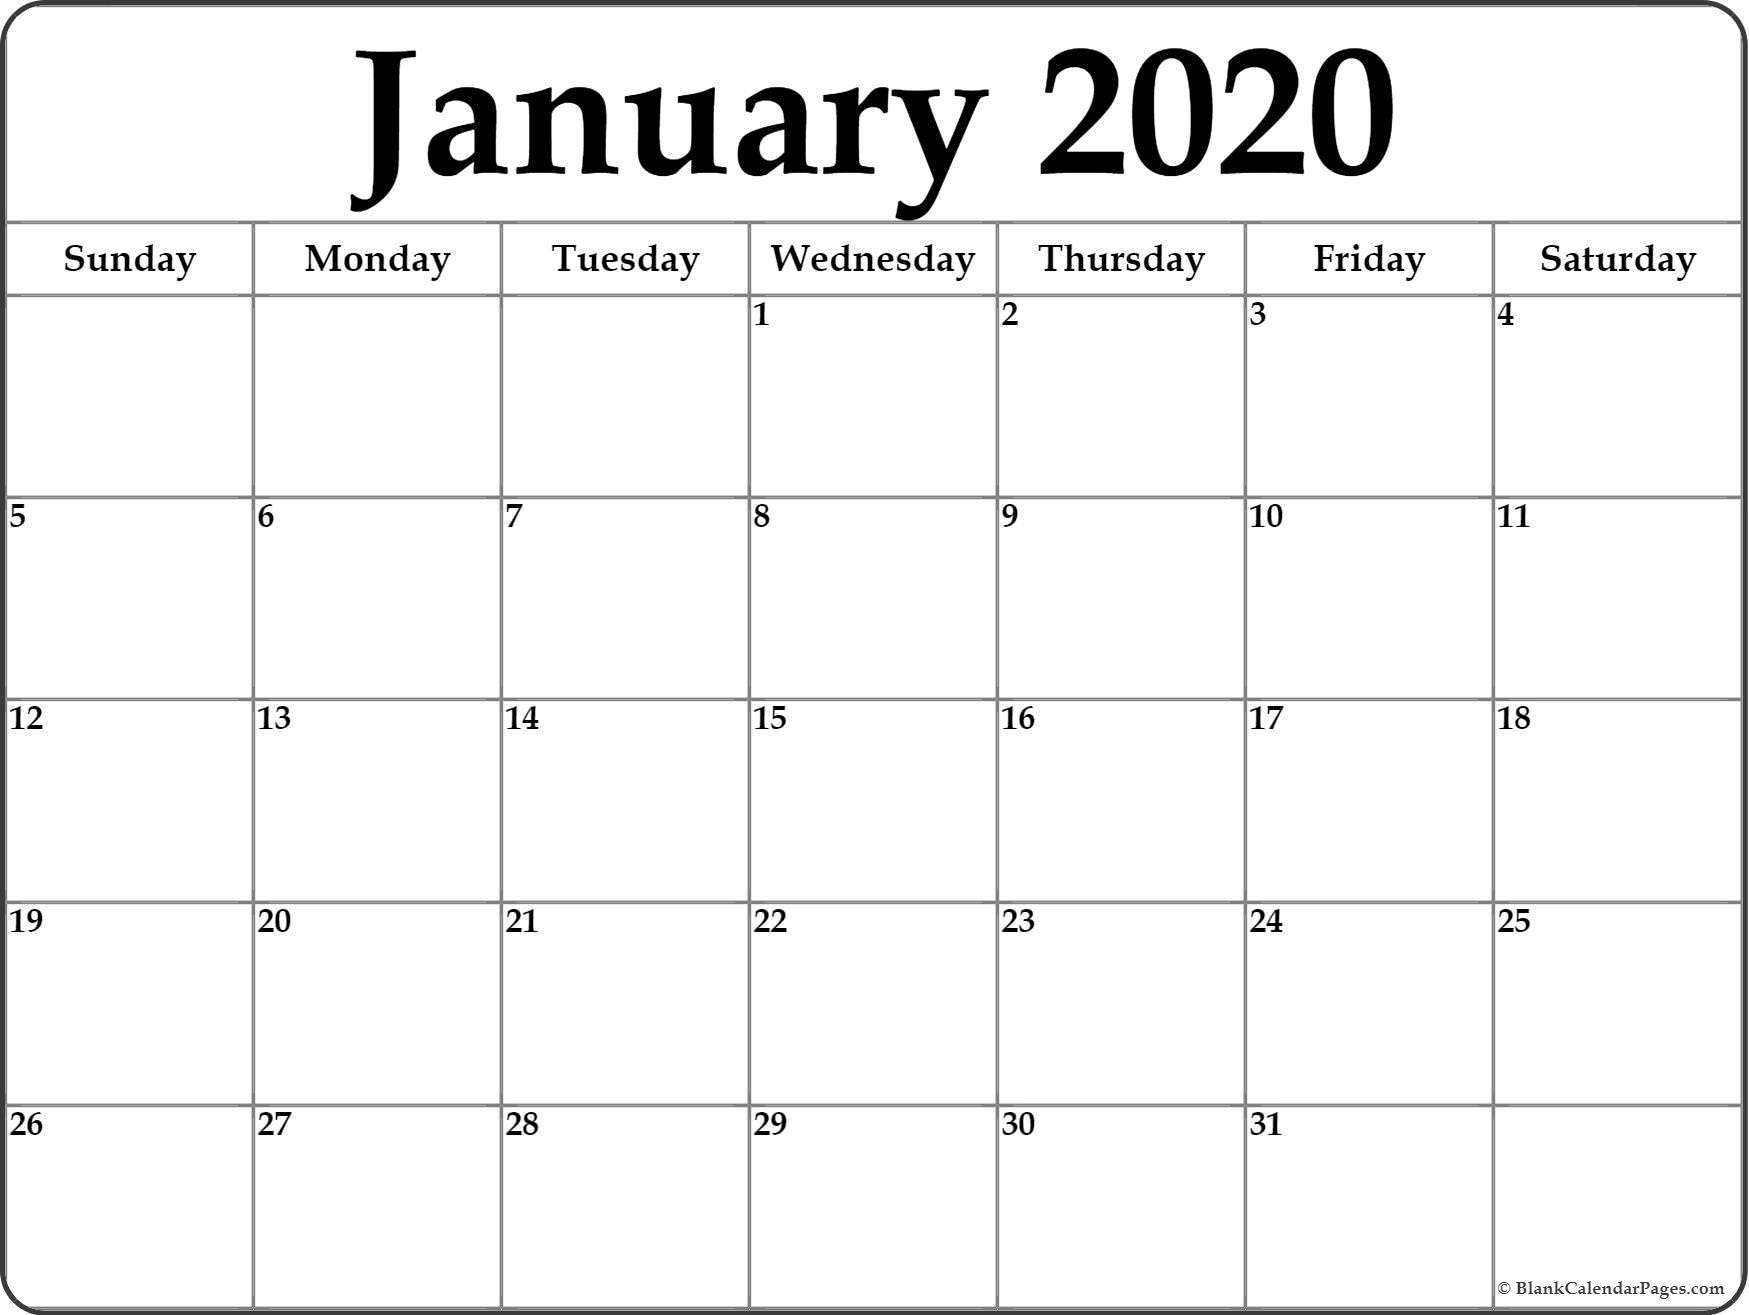 Free Printable Calendar 2020 By Month | Free Printable